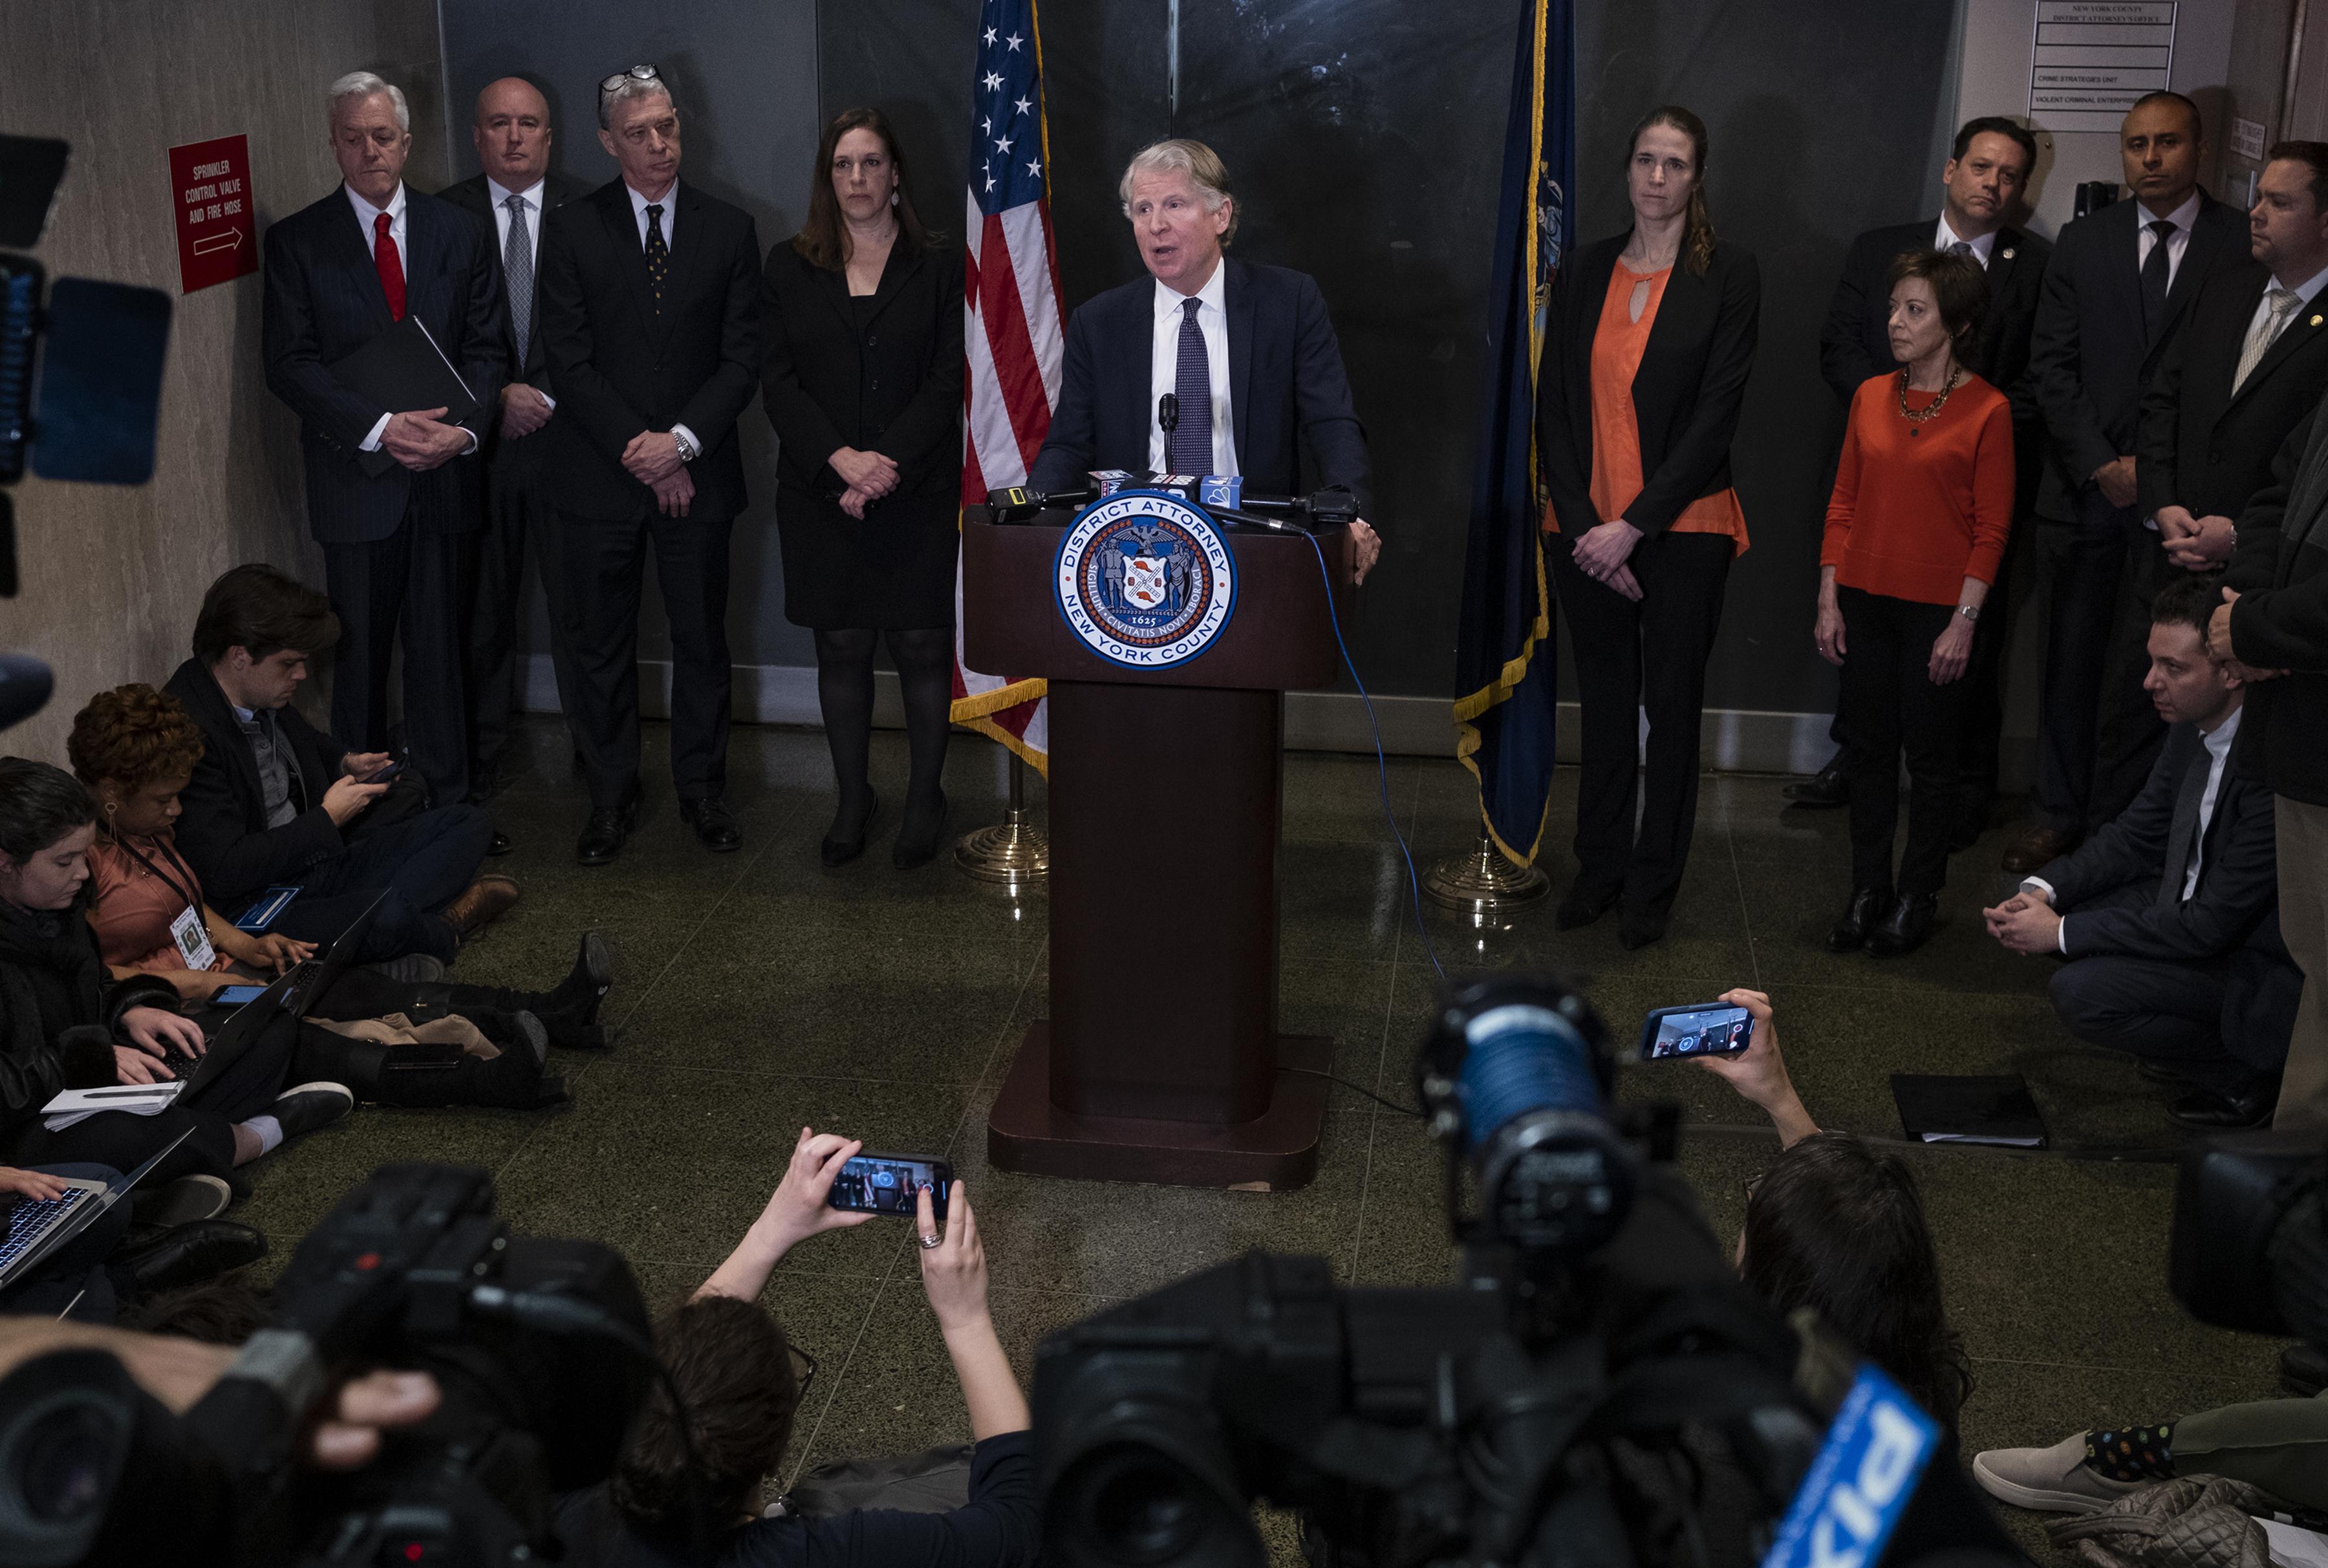 Manhattan District Attorney Cyrus Vance Jr., speaks after the verdict in the Harvey Weinstein rape trial, Monday, February 24, in New York.